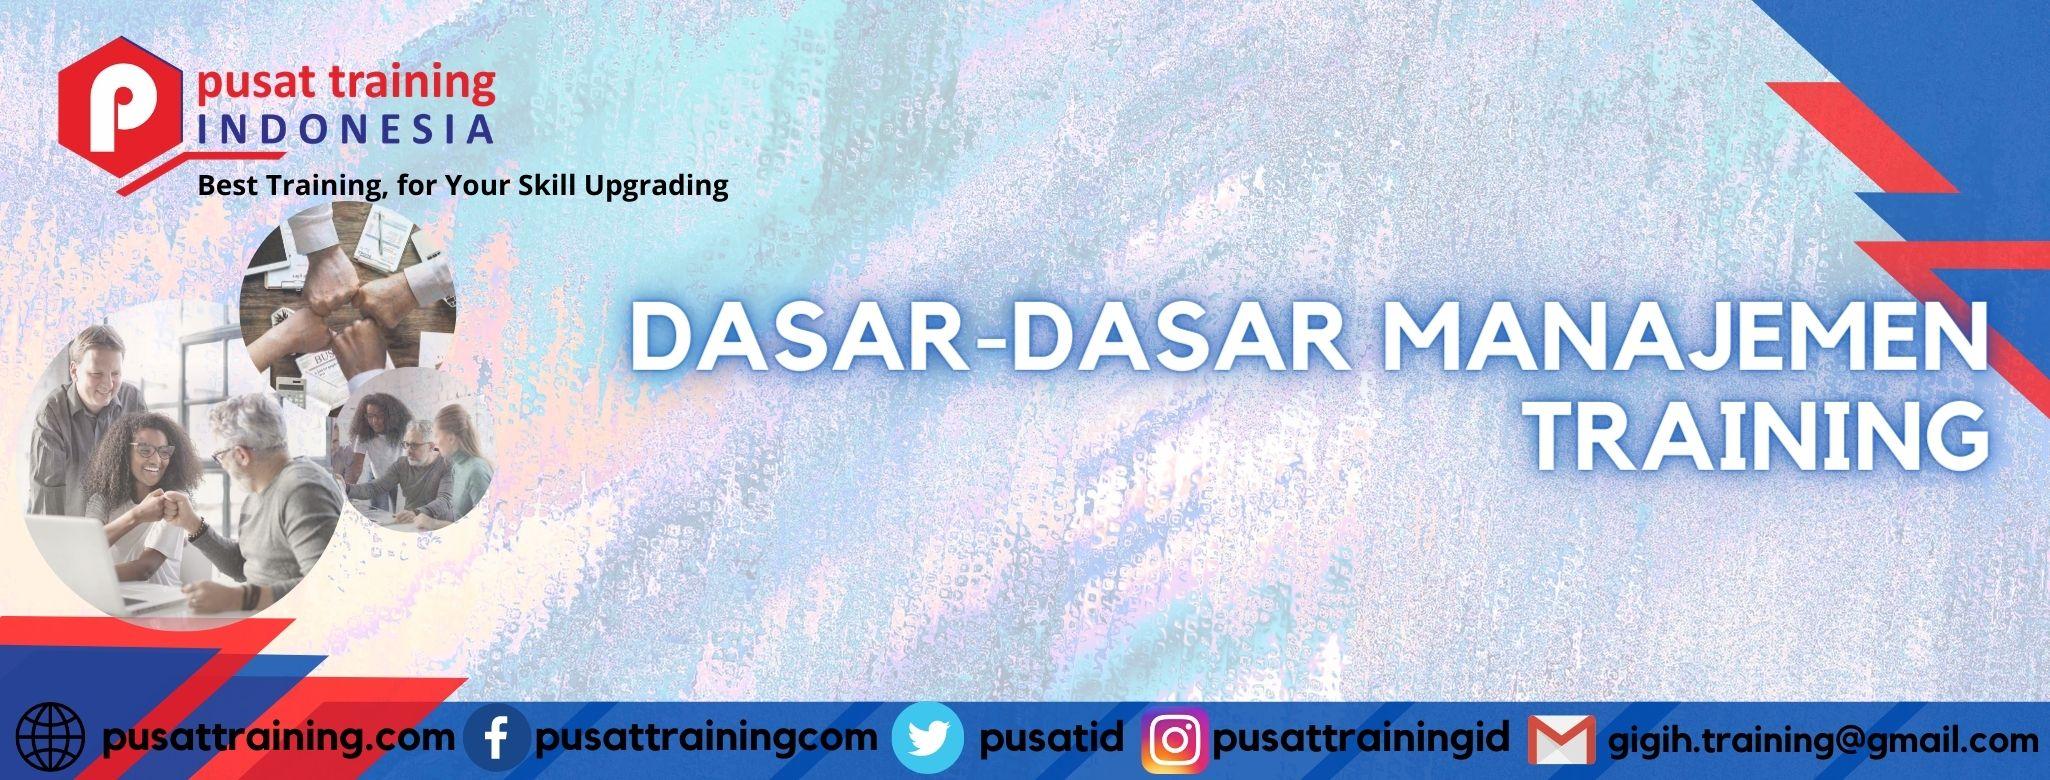 DASAR-DASAR MANAJEMEN TRAINING